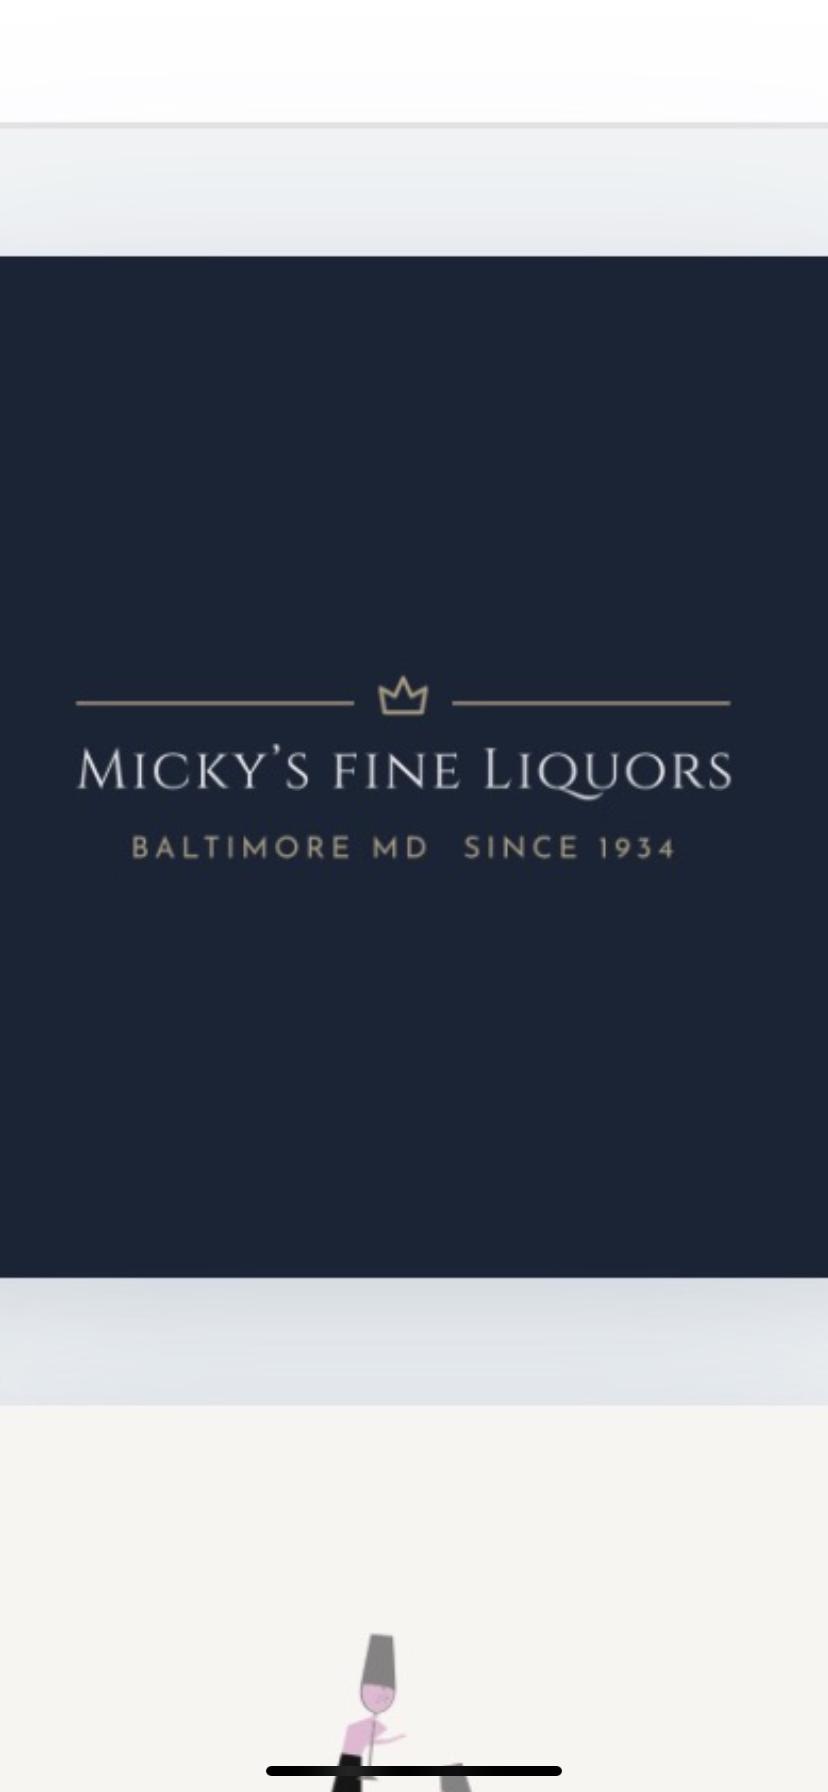 Micky's Fine Liquors